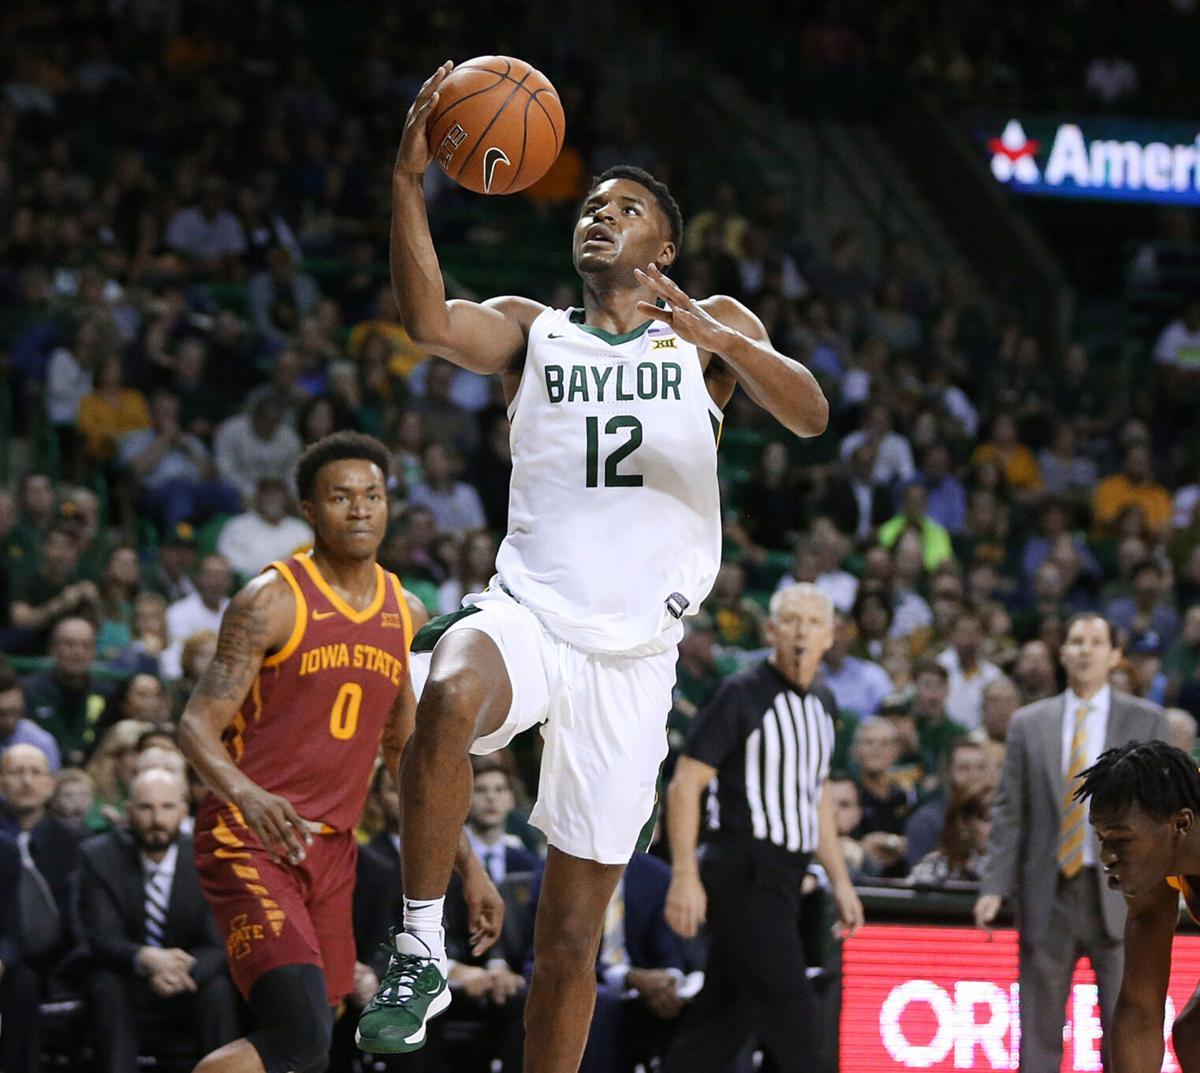 bu basketball (copy)